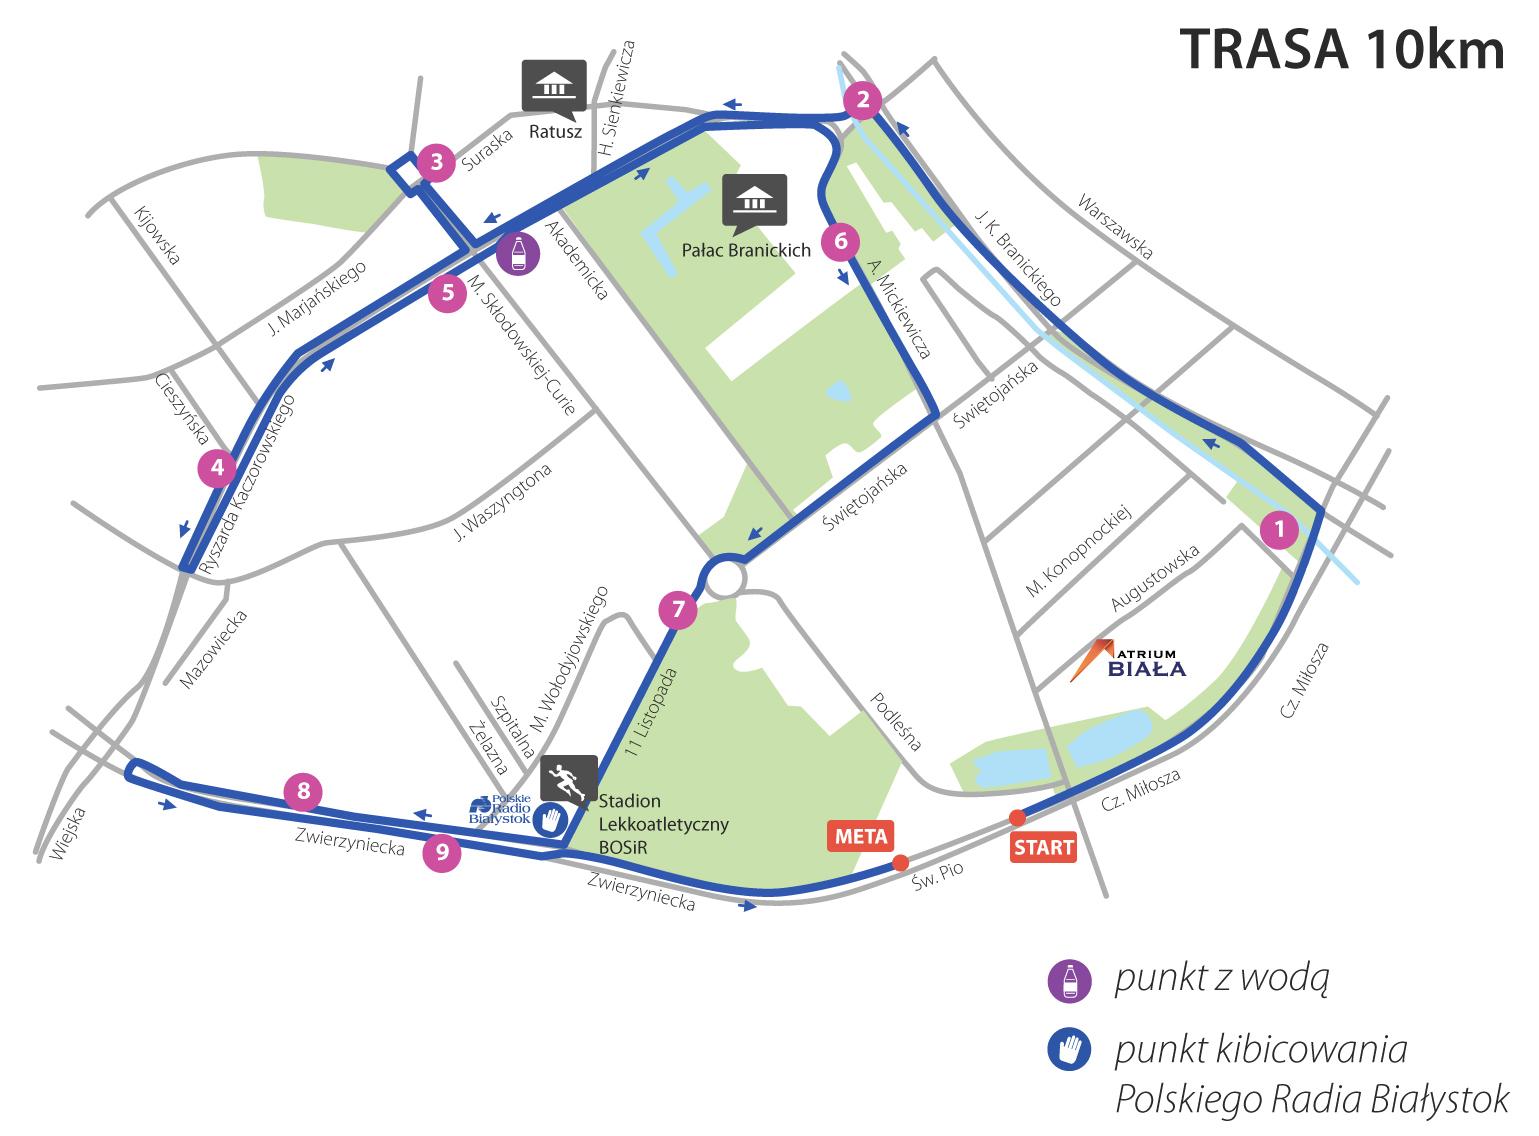 Trasa - dystans 10 km